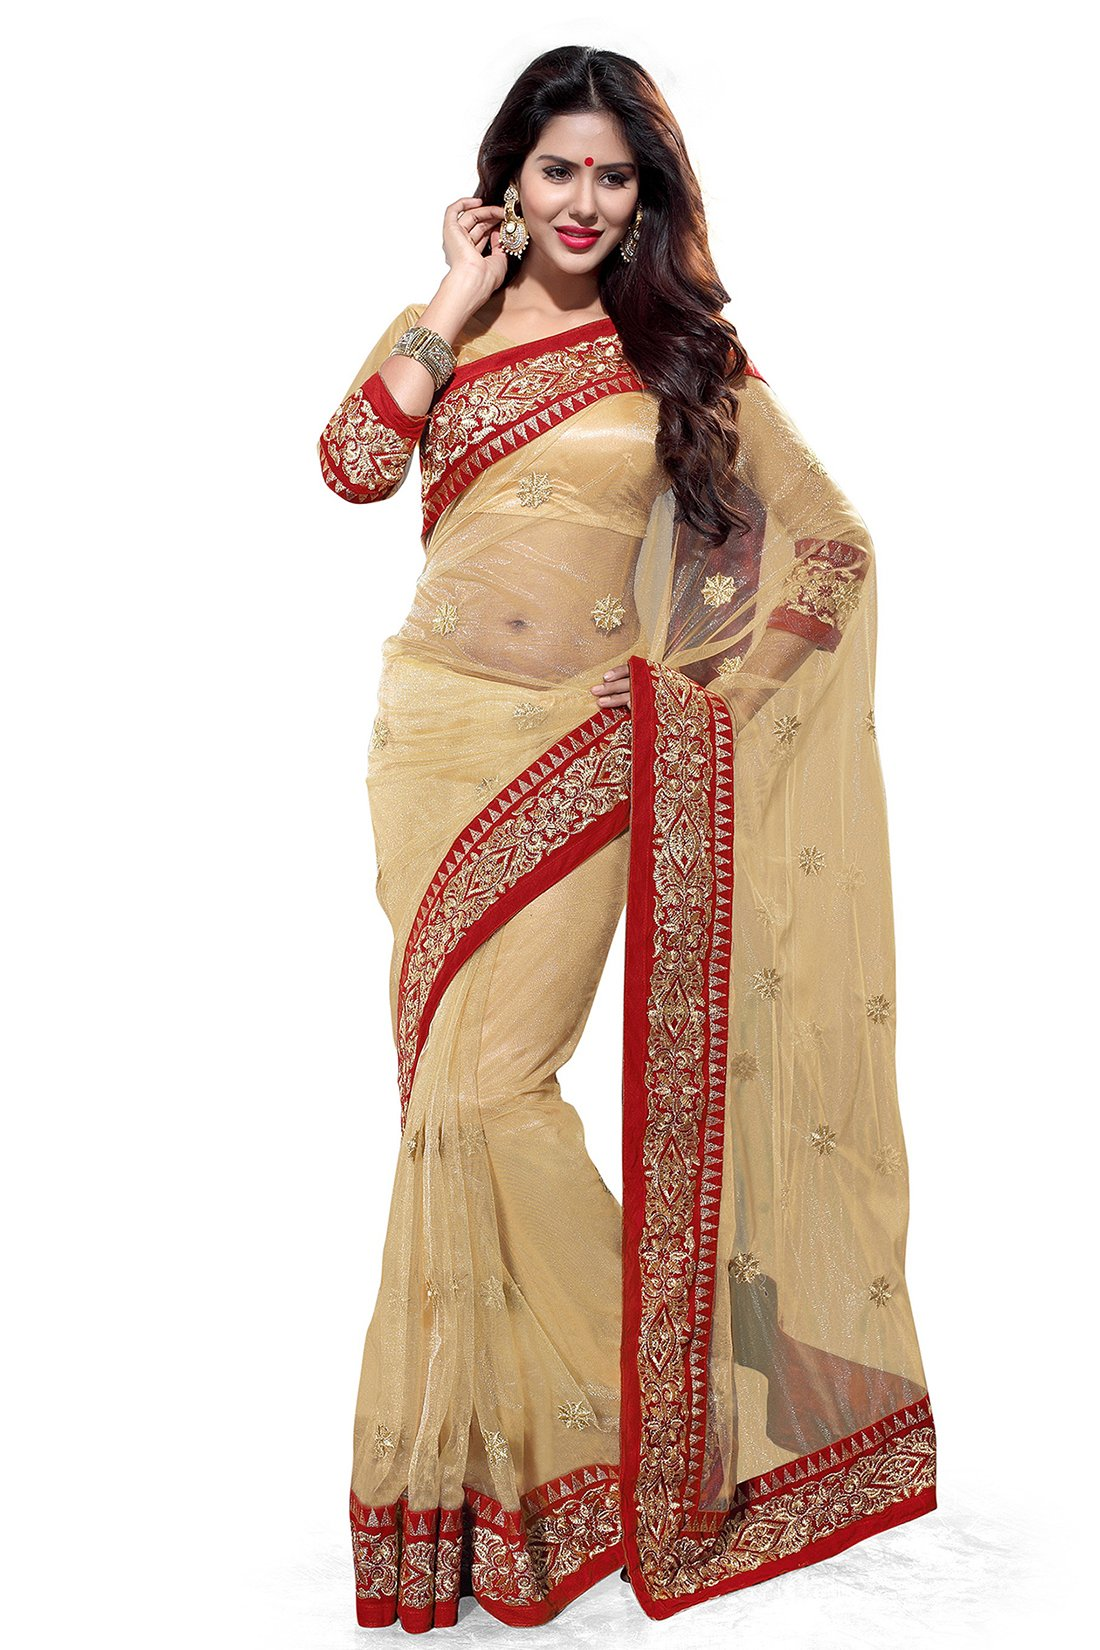 Mirchi Fashion Women's Net Zari Wedding Party Wear Indian Saree Free Size Beige